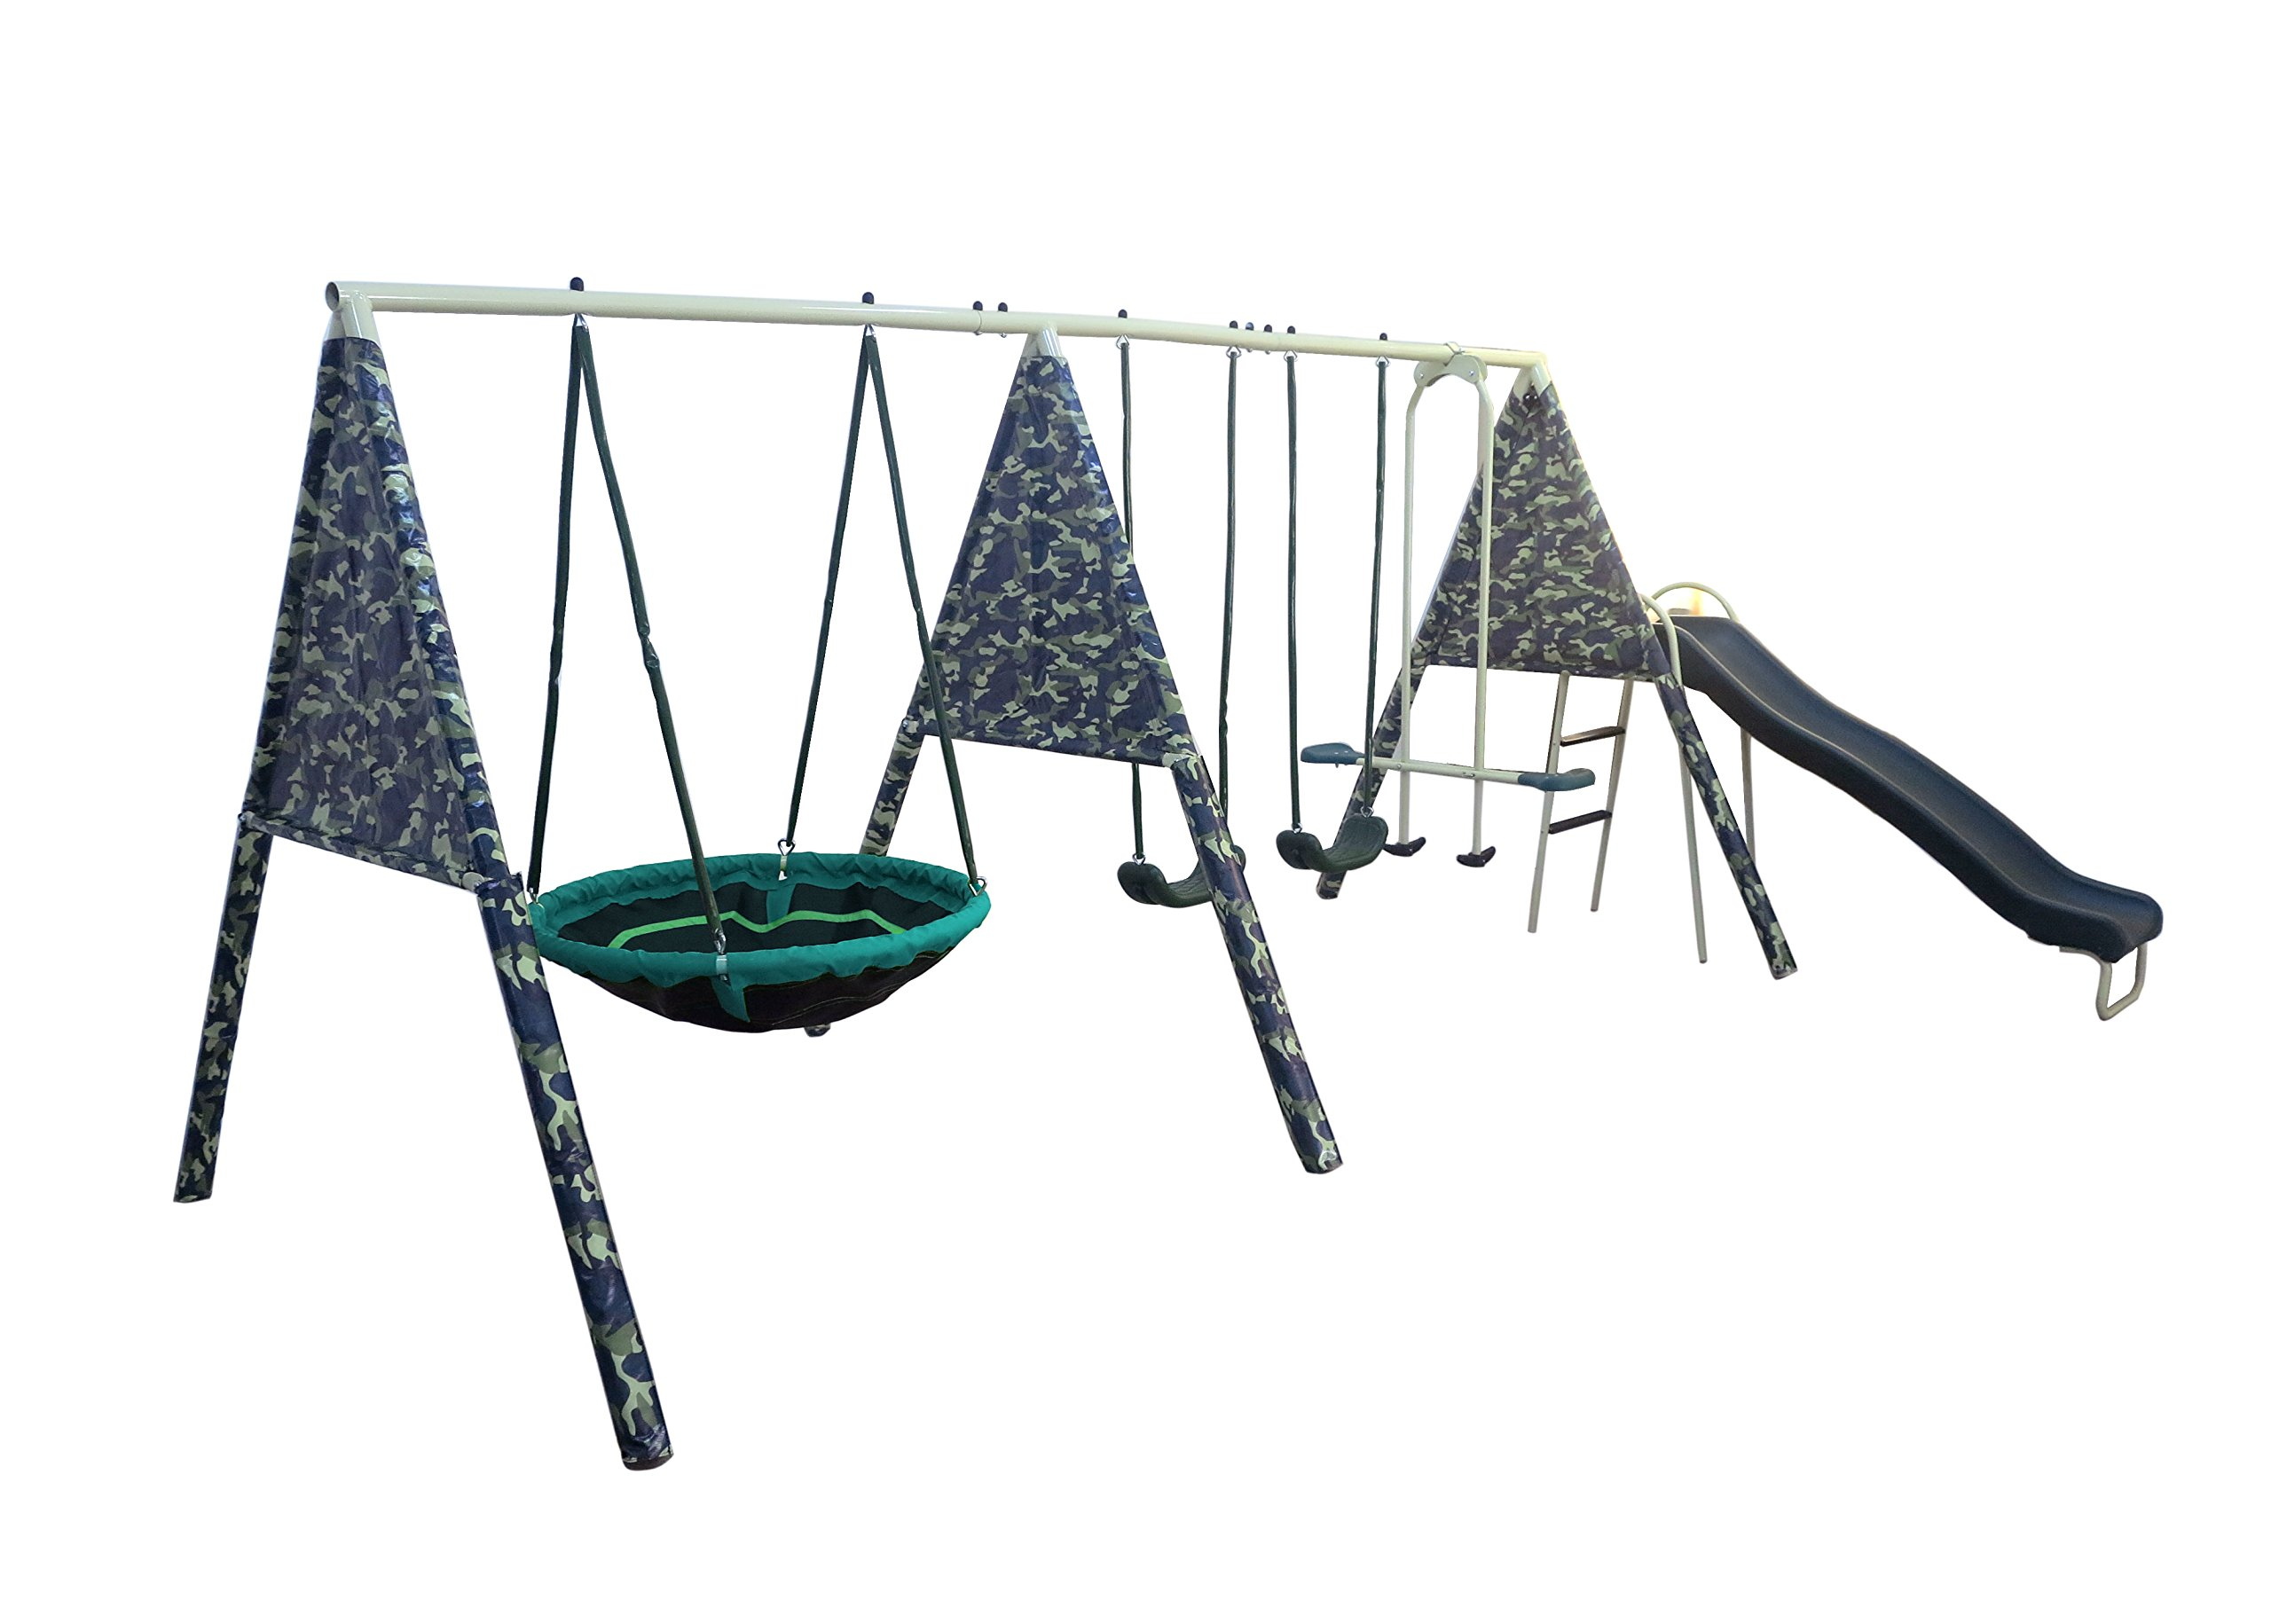 XDP Recreation ''Camo Commander Swing Set by XDP Recreation (Image #2)